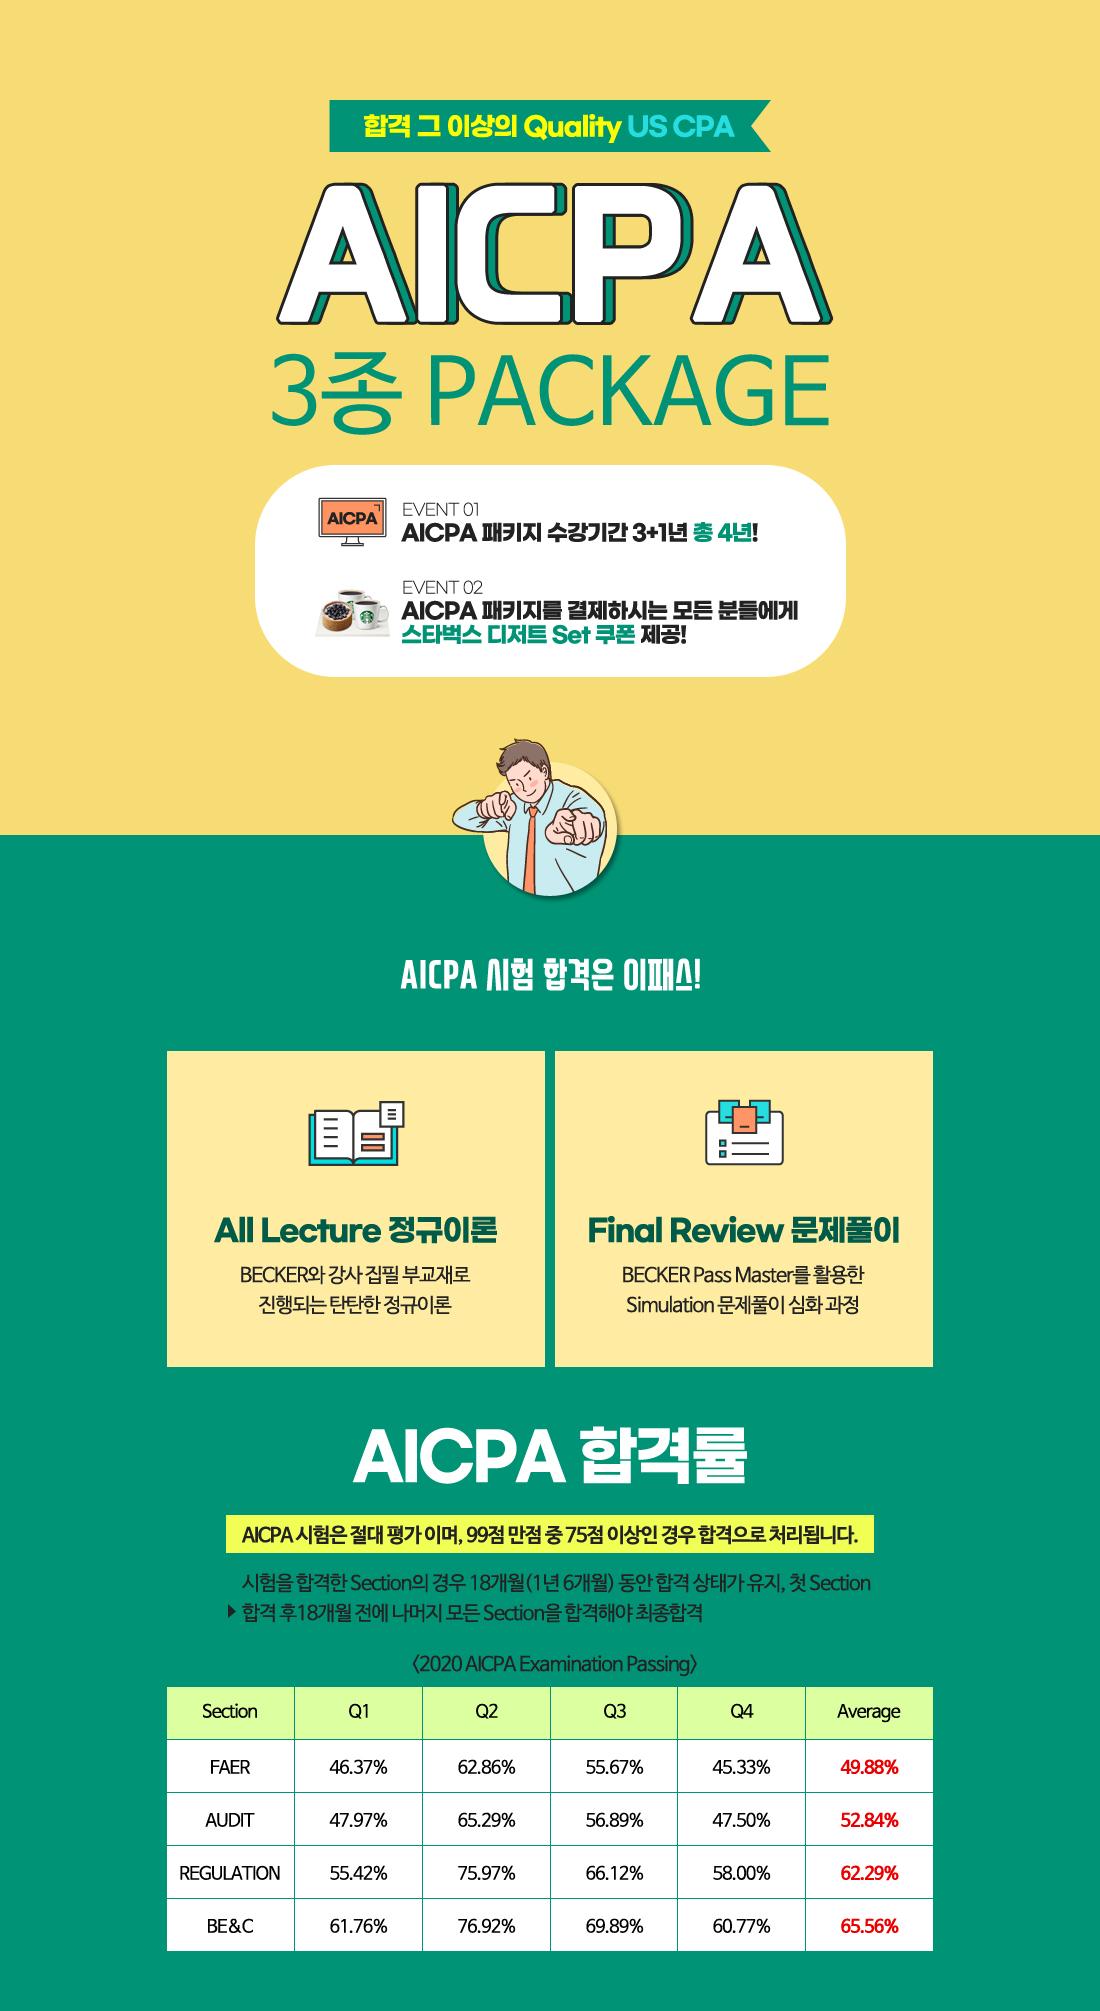 AICPA 패키지